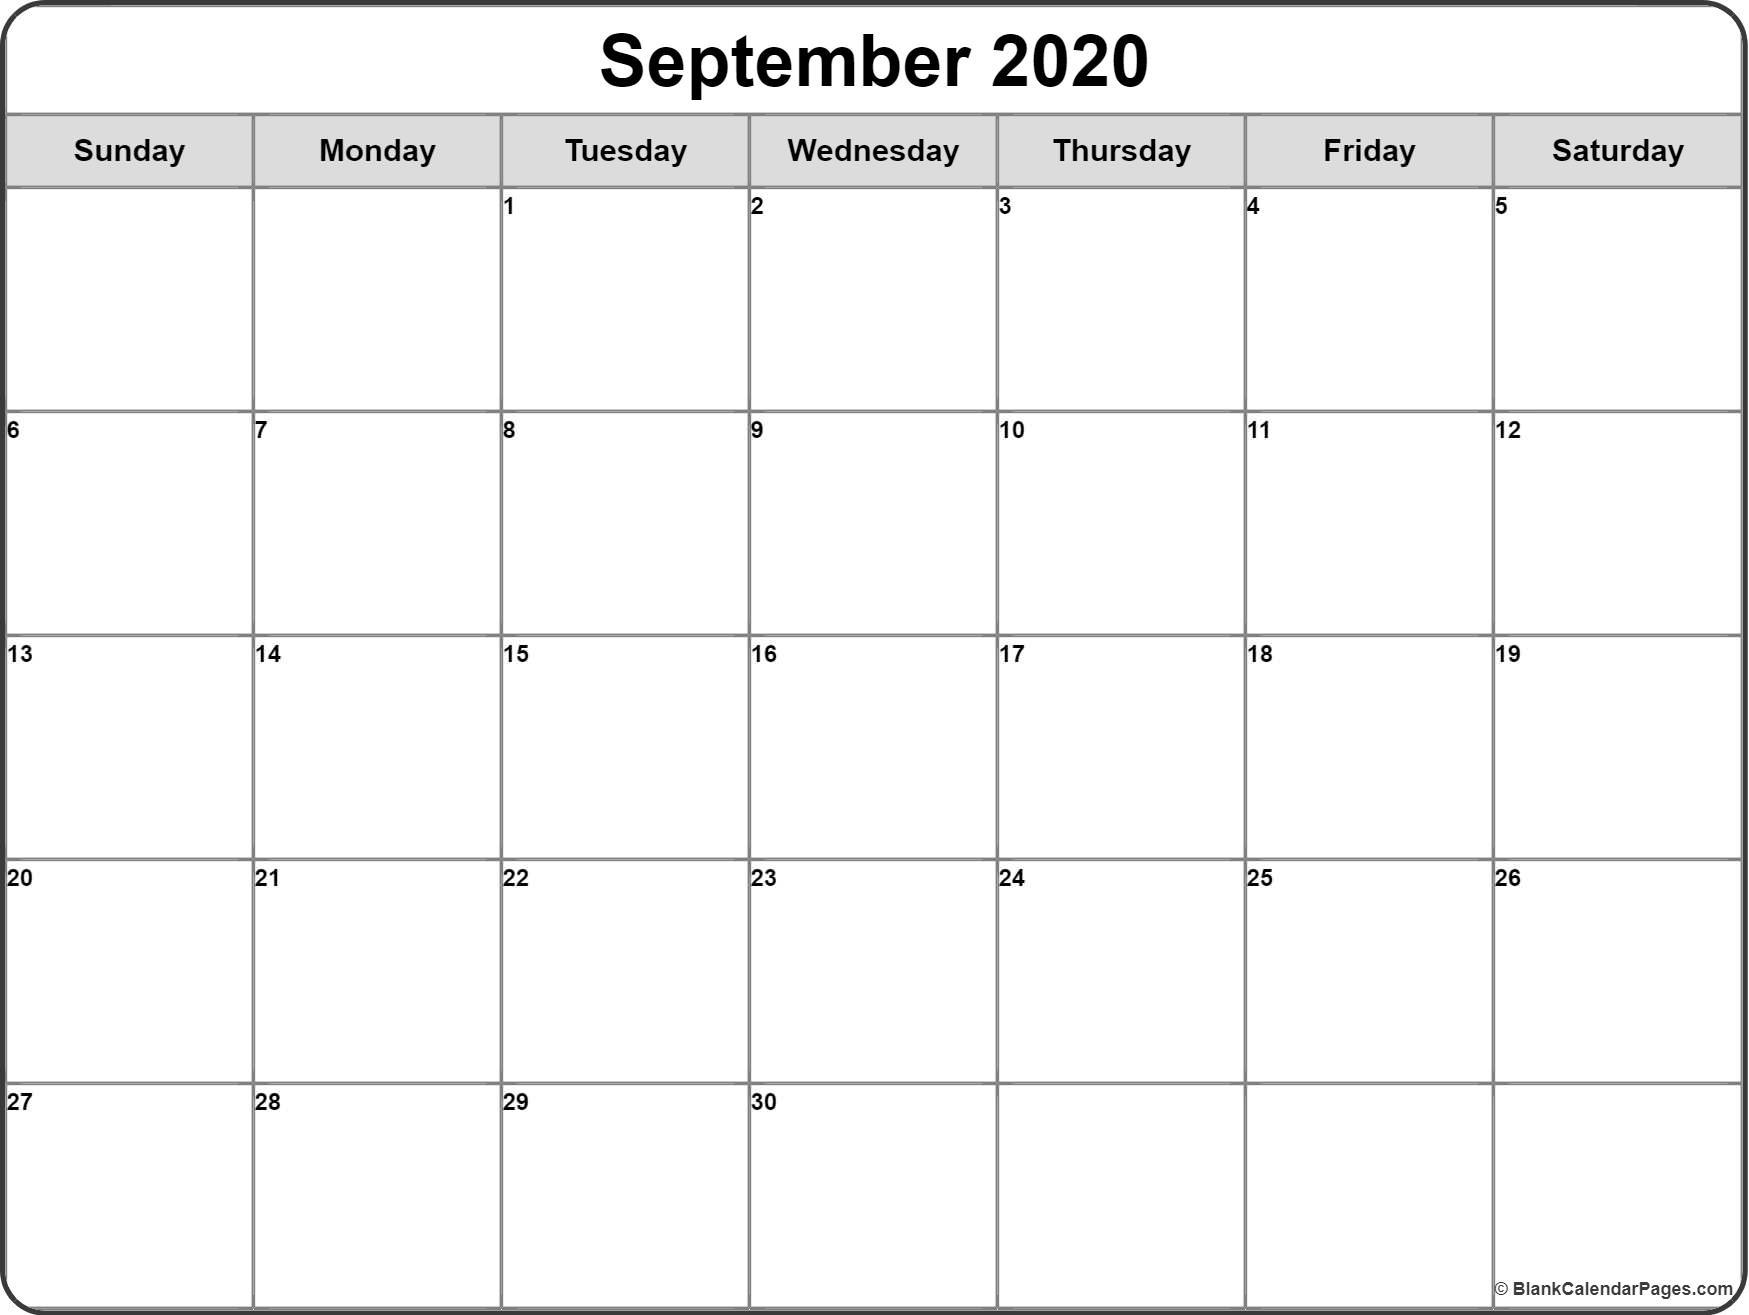 September 2020 Calendar   Free Printable Monthly Calendars